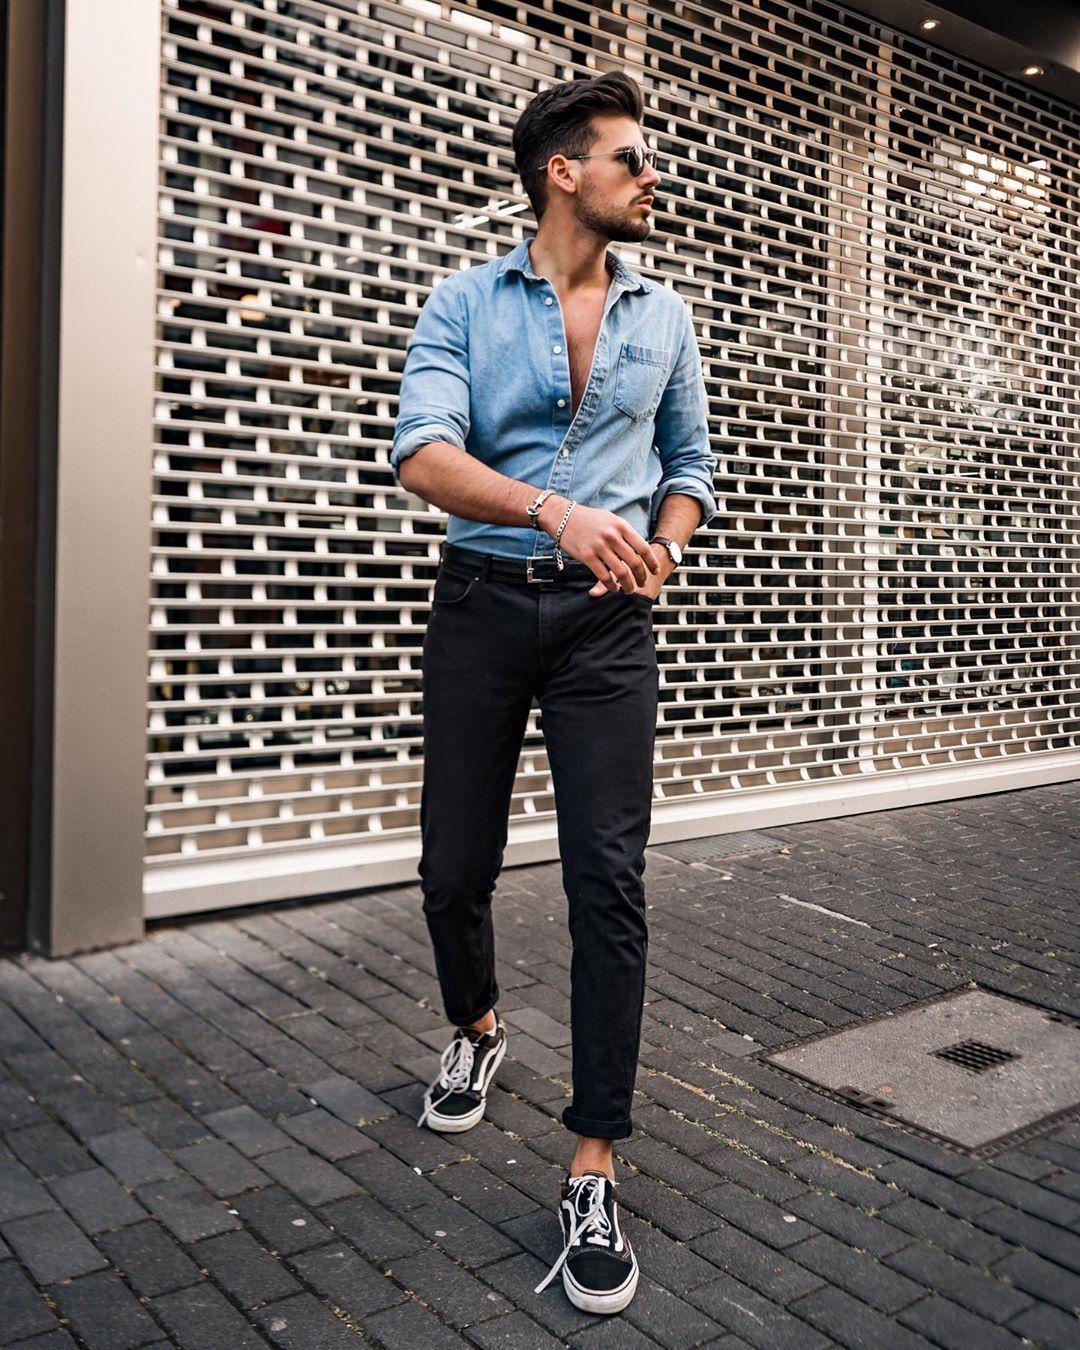 Men S Fashion Dominik Rubino On Instagram Black Jeans Blue Denim Shirt Yes Or No Mens Denim Shirt Outfit Blue Denim Shirt Outfit Denim Outfit Men [ 1350 x 1080 Pixel ]